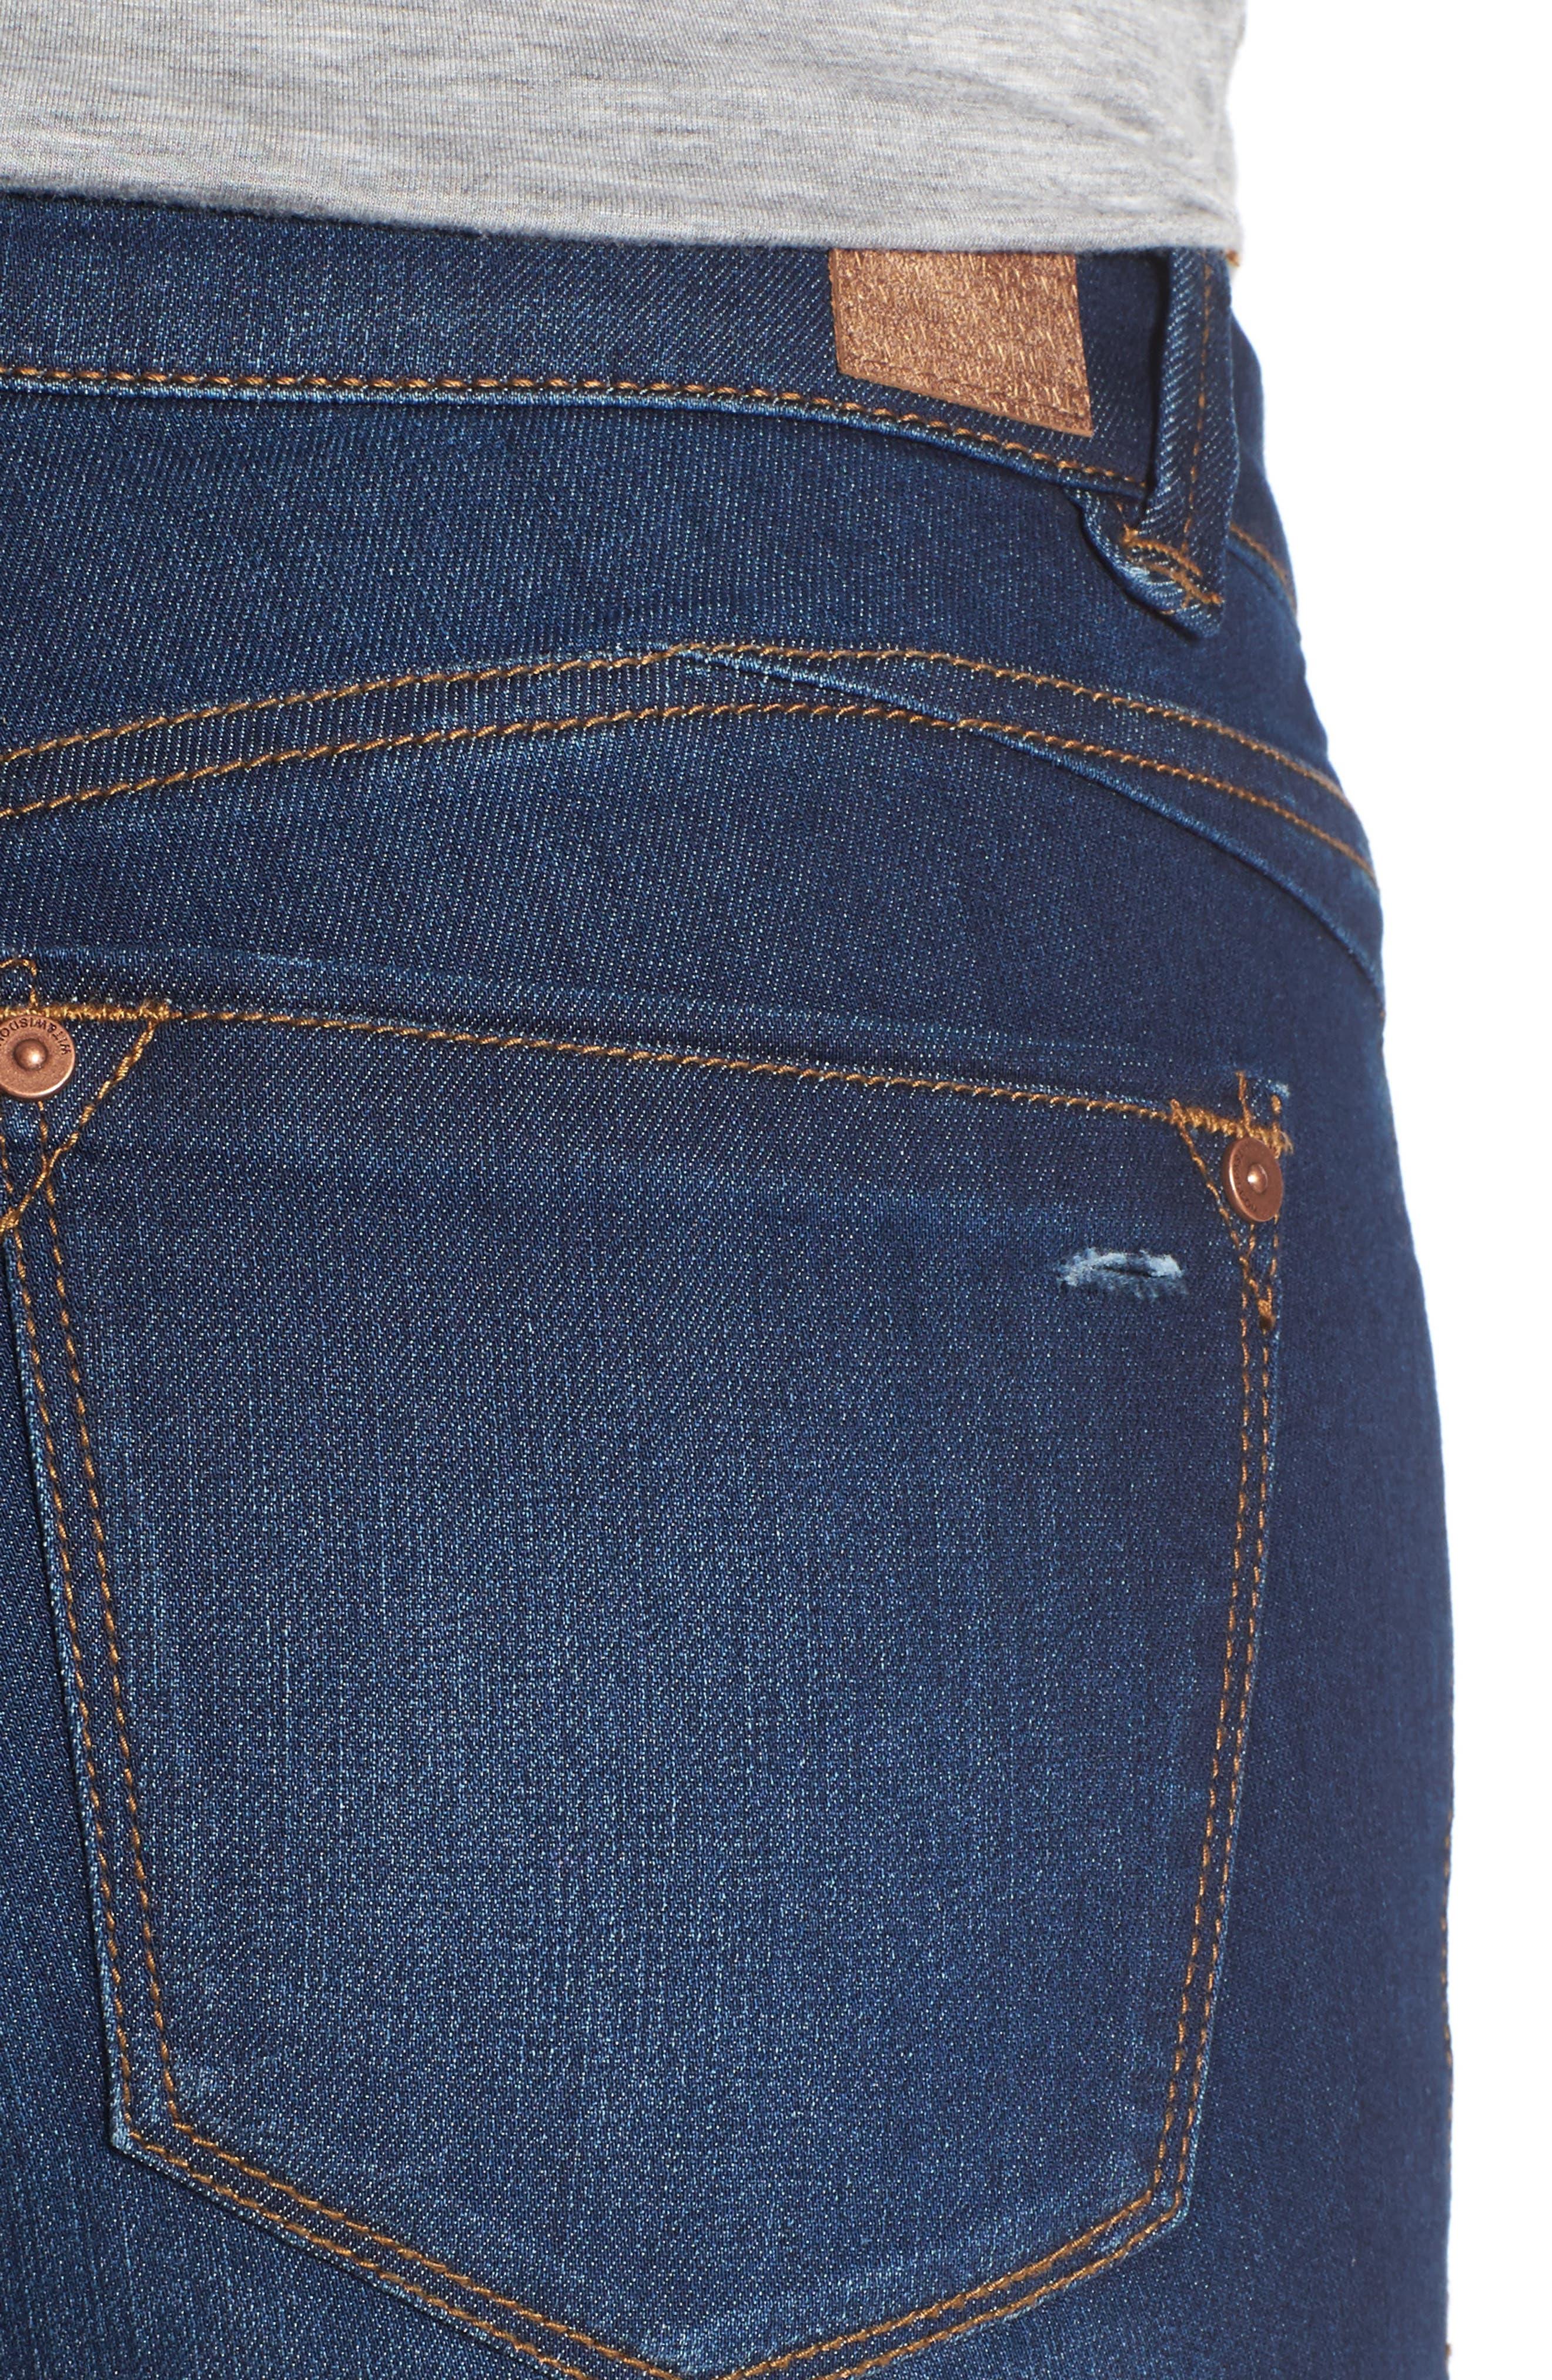 Skinny Ankle Jeans,                             Alternate thumbnail 4, color,